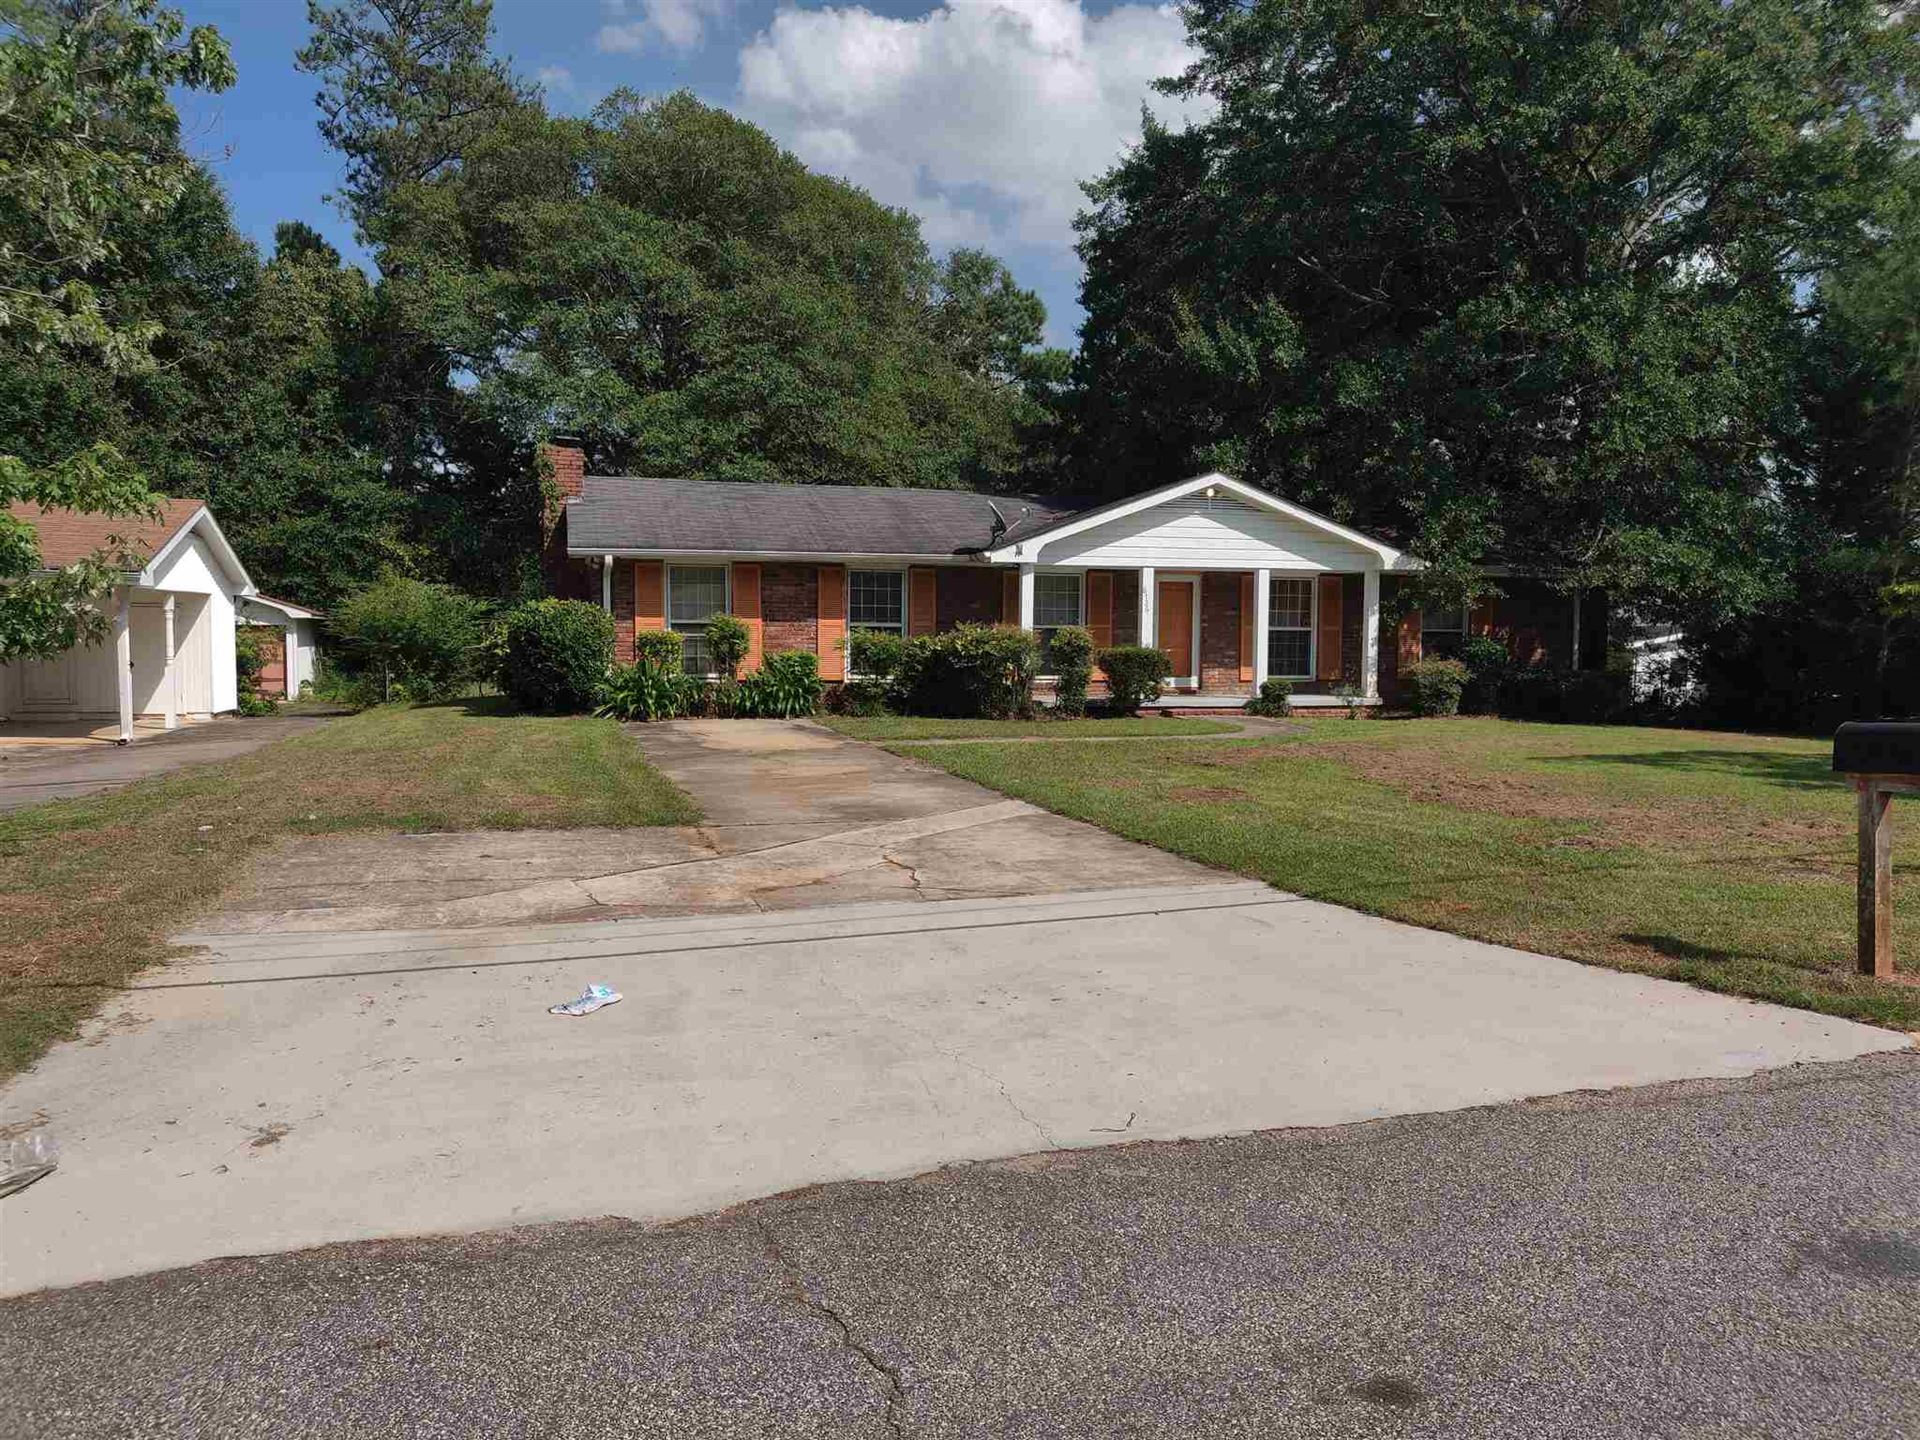 6726 Primrose Ln, Jonesboro, GA 30236 - #: 8843199